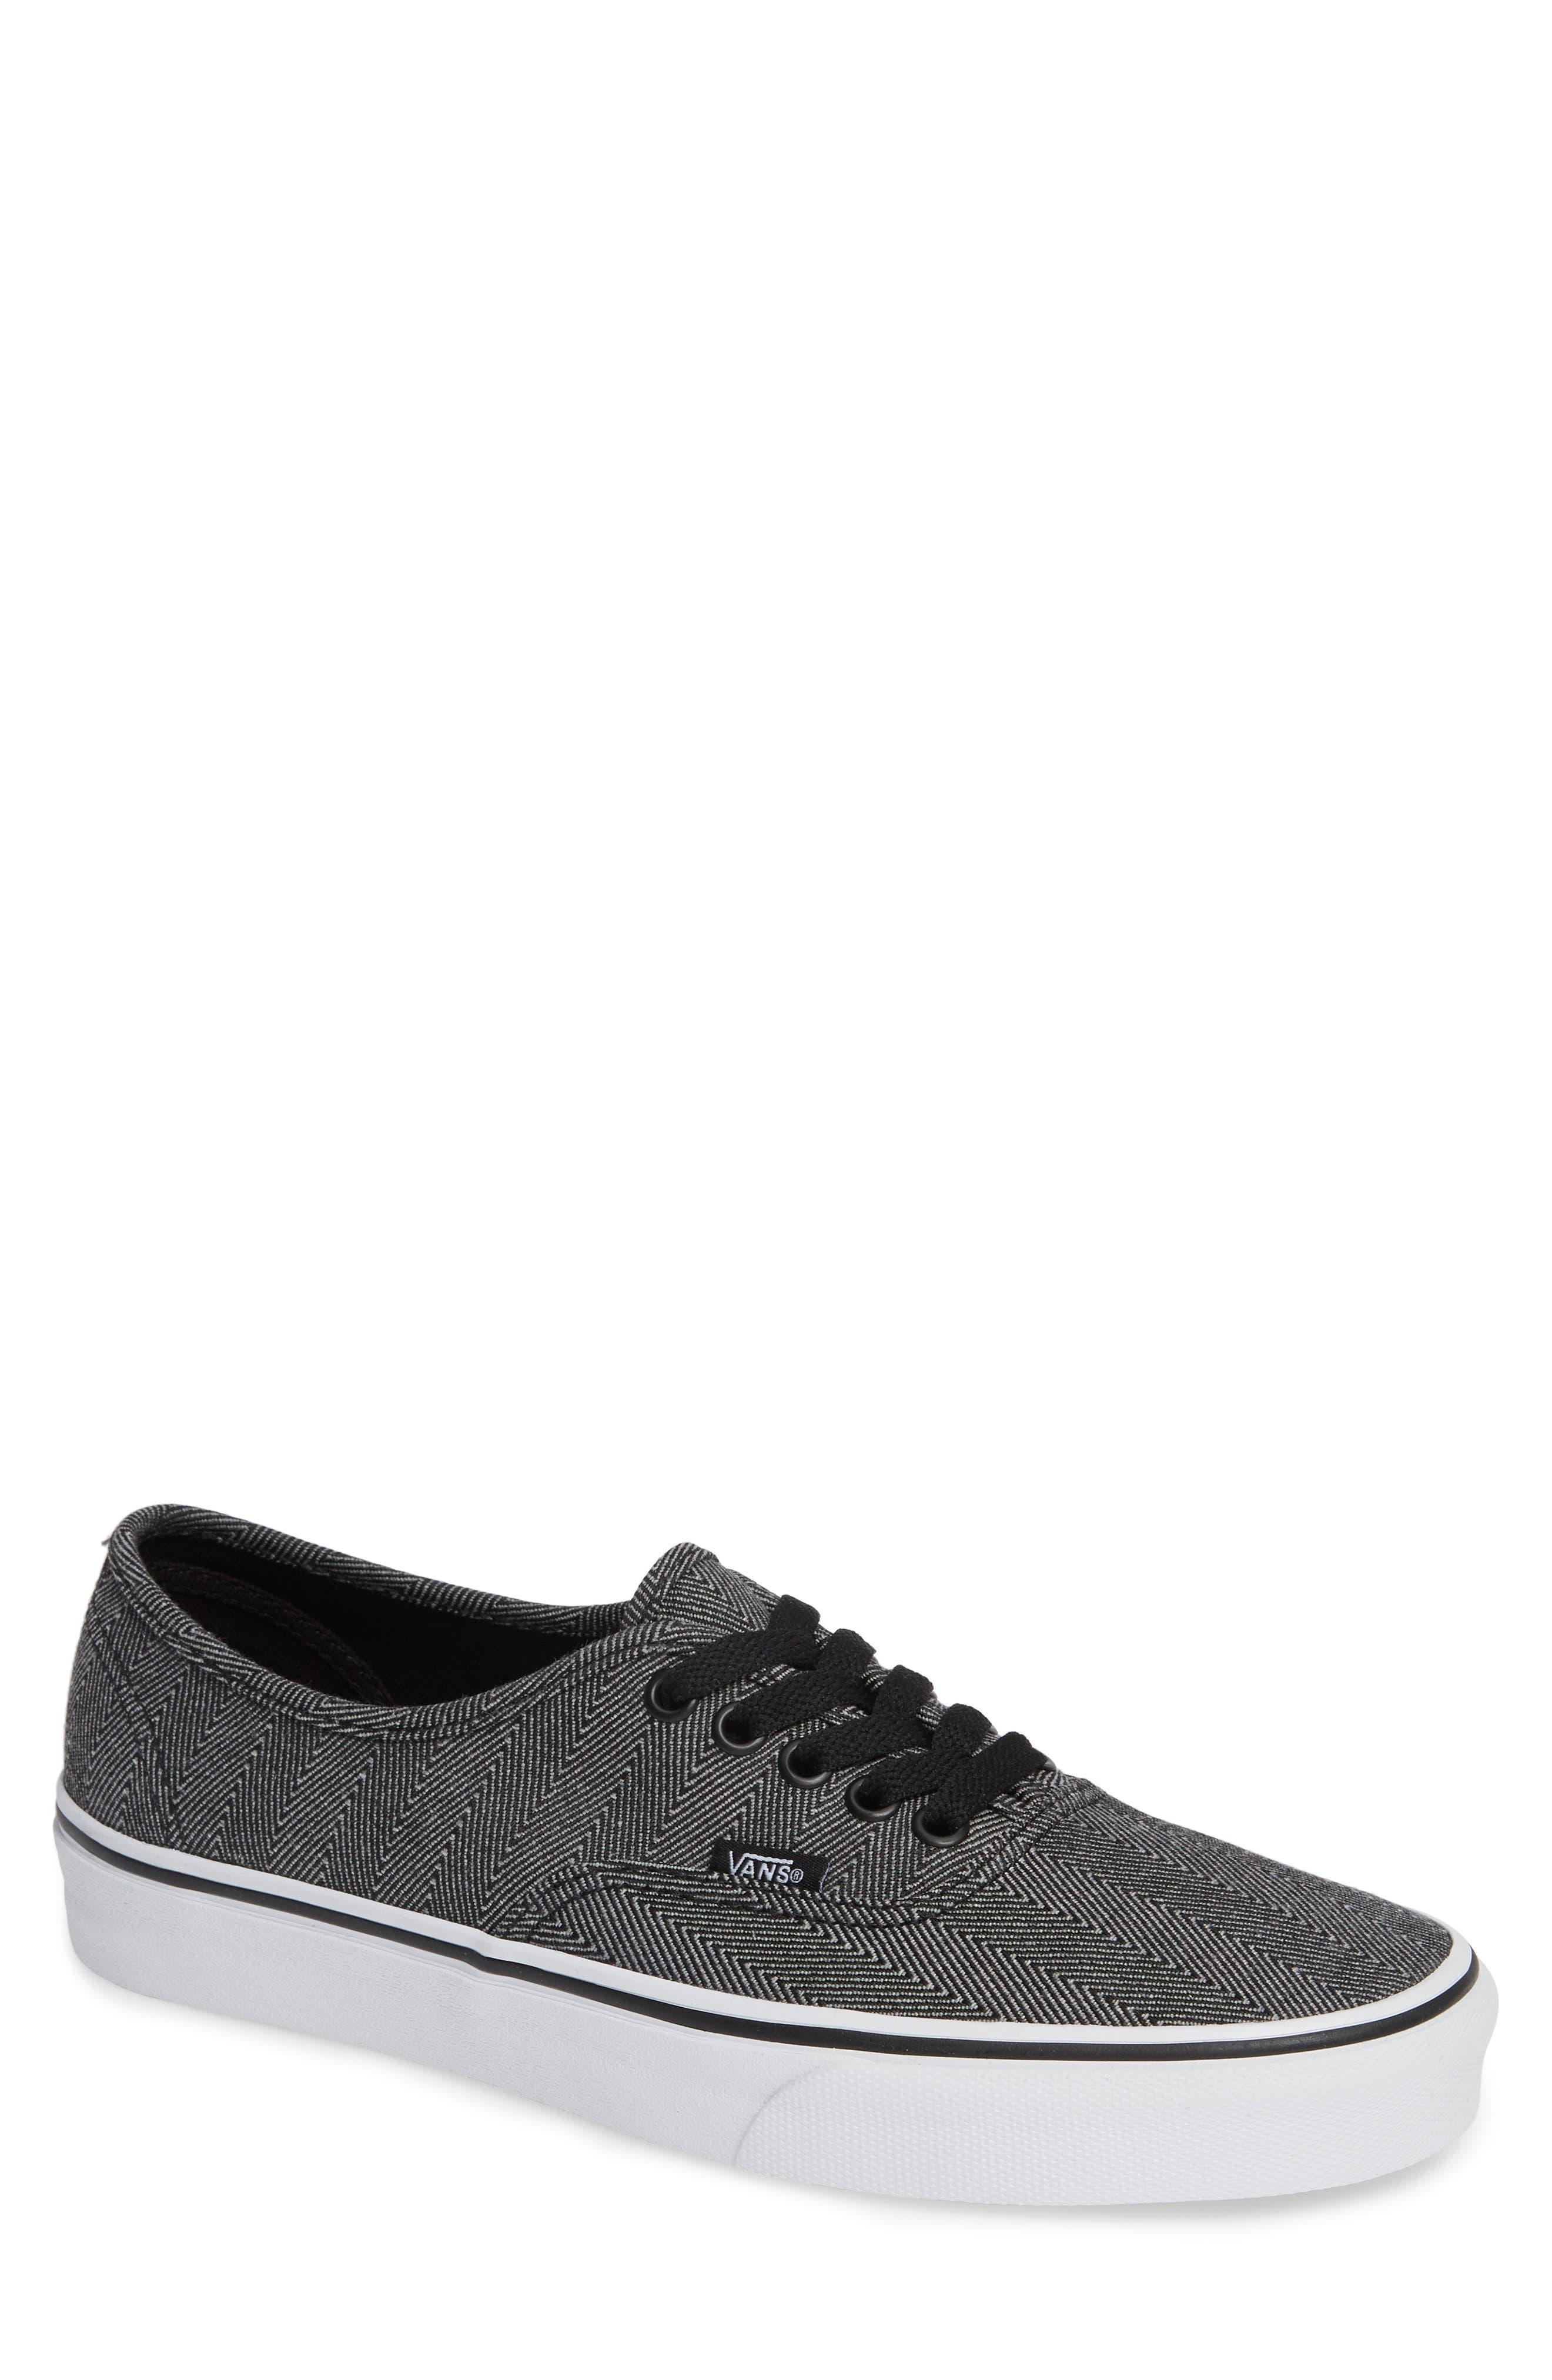 UA Authentic Sneaker,                             Main thumbnail 1, color,                             BLACK/ TRUE WHITE